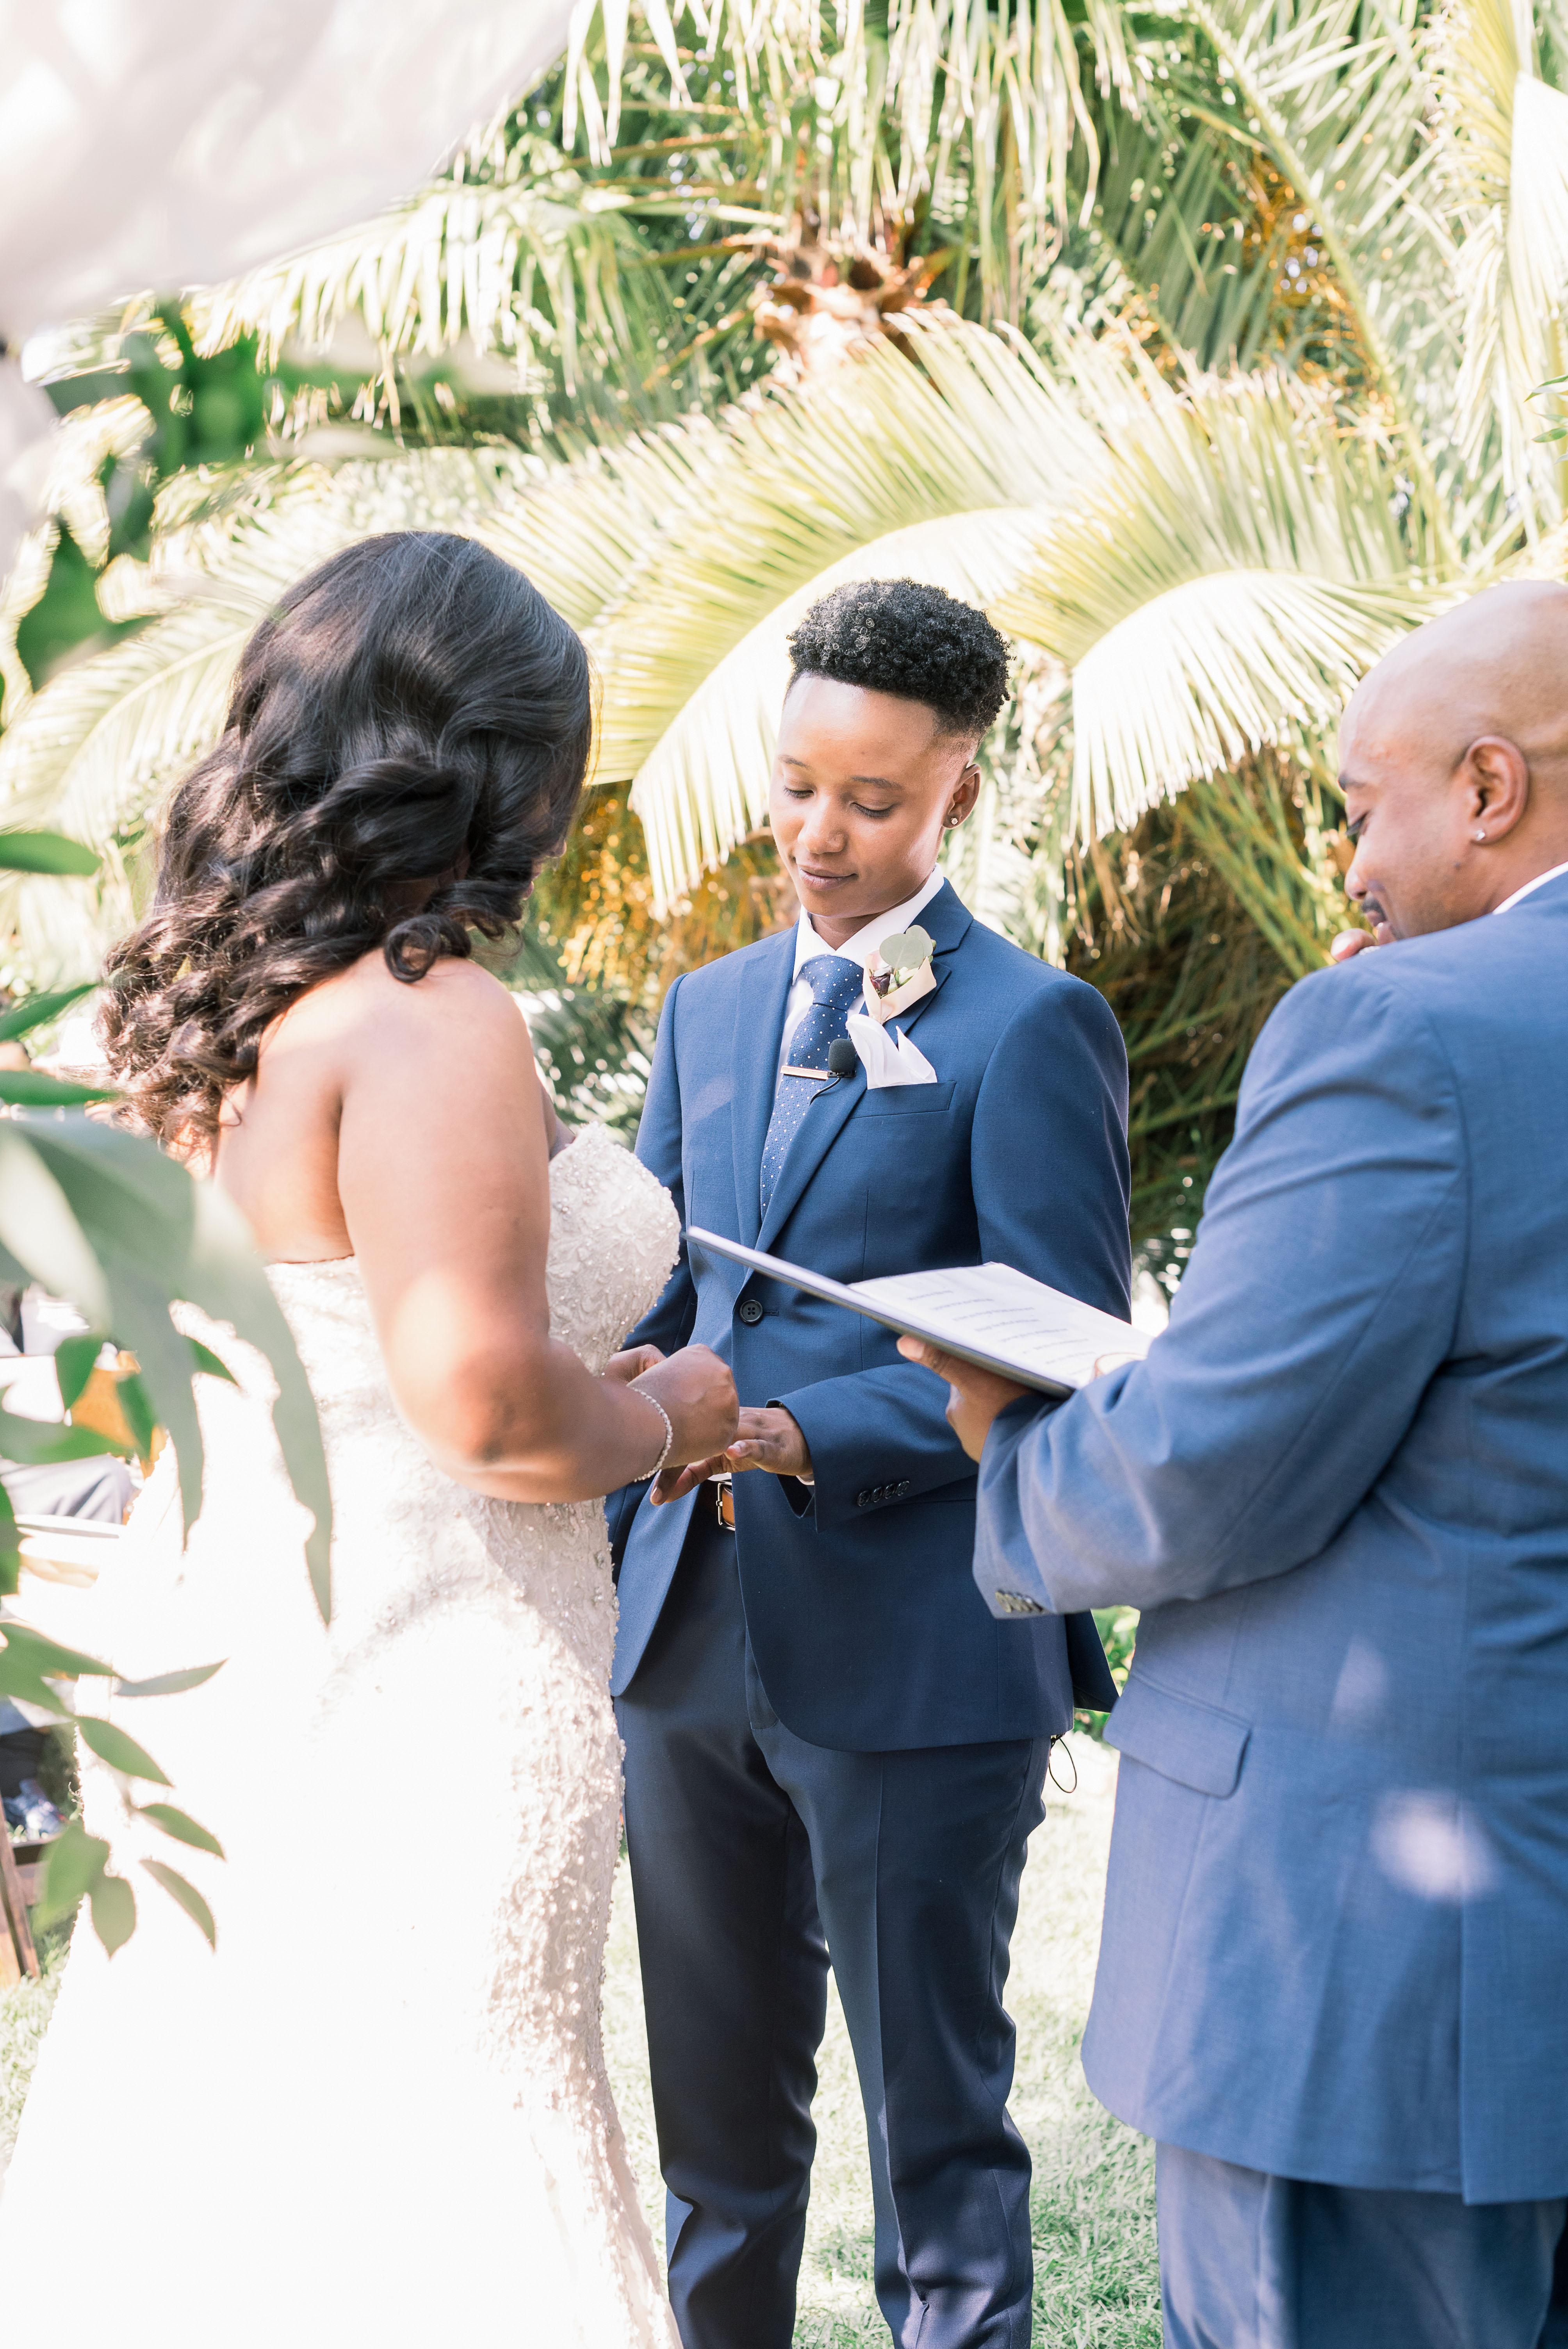 outdoor wedding reception vow ring exchange